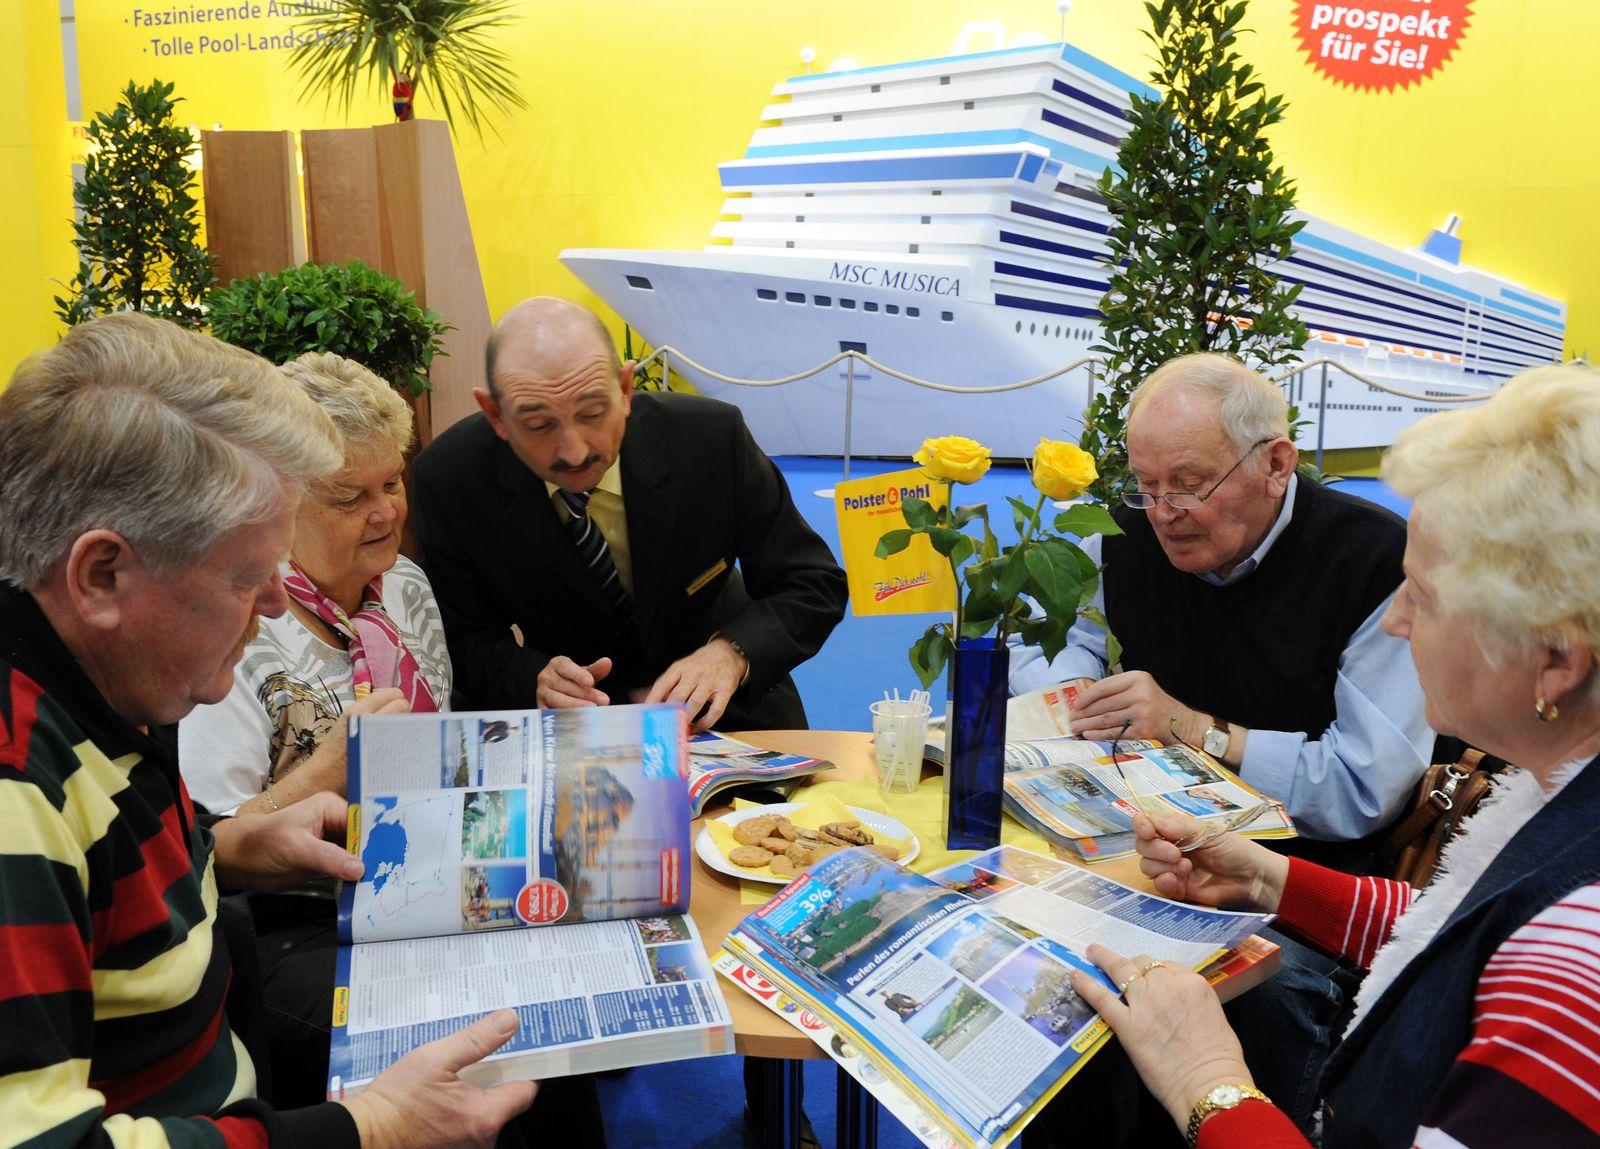 Urlauber / Senioren / Reisen